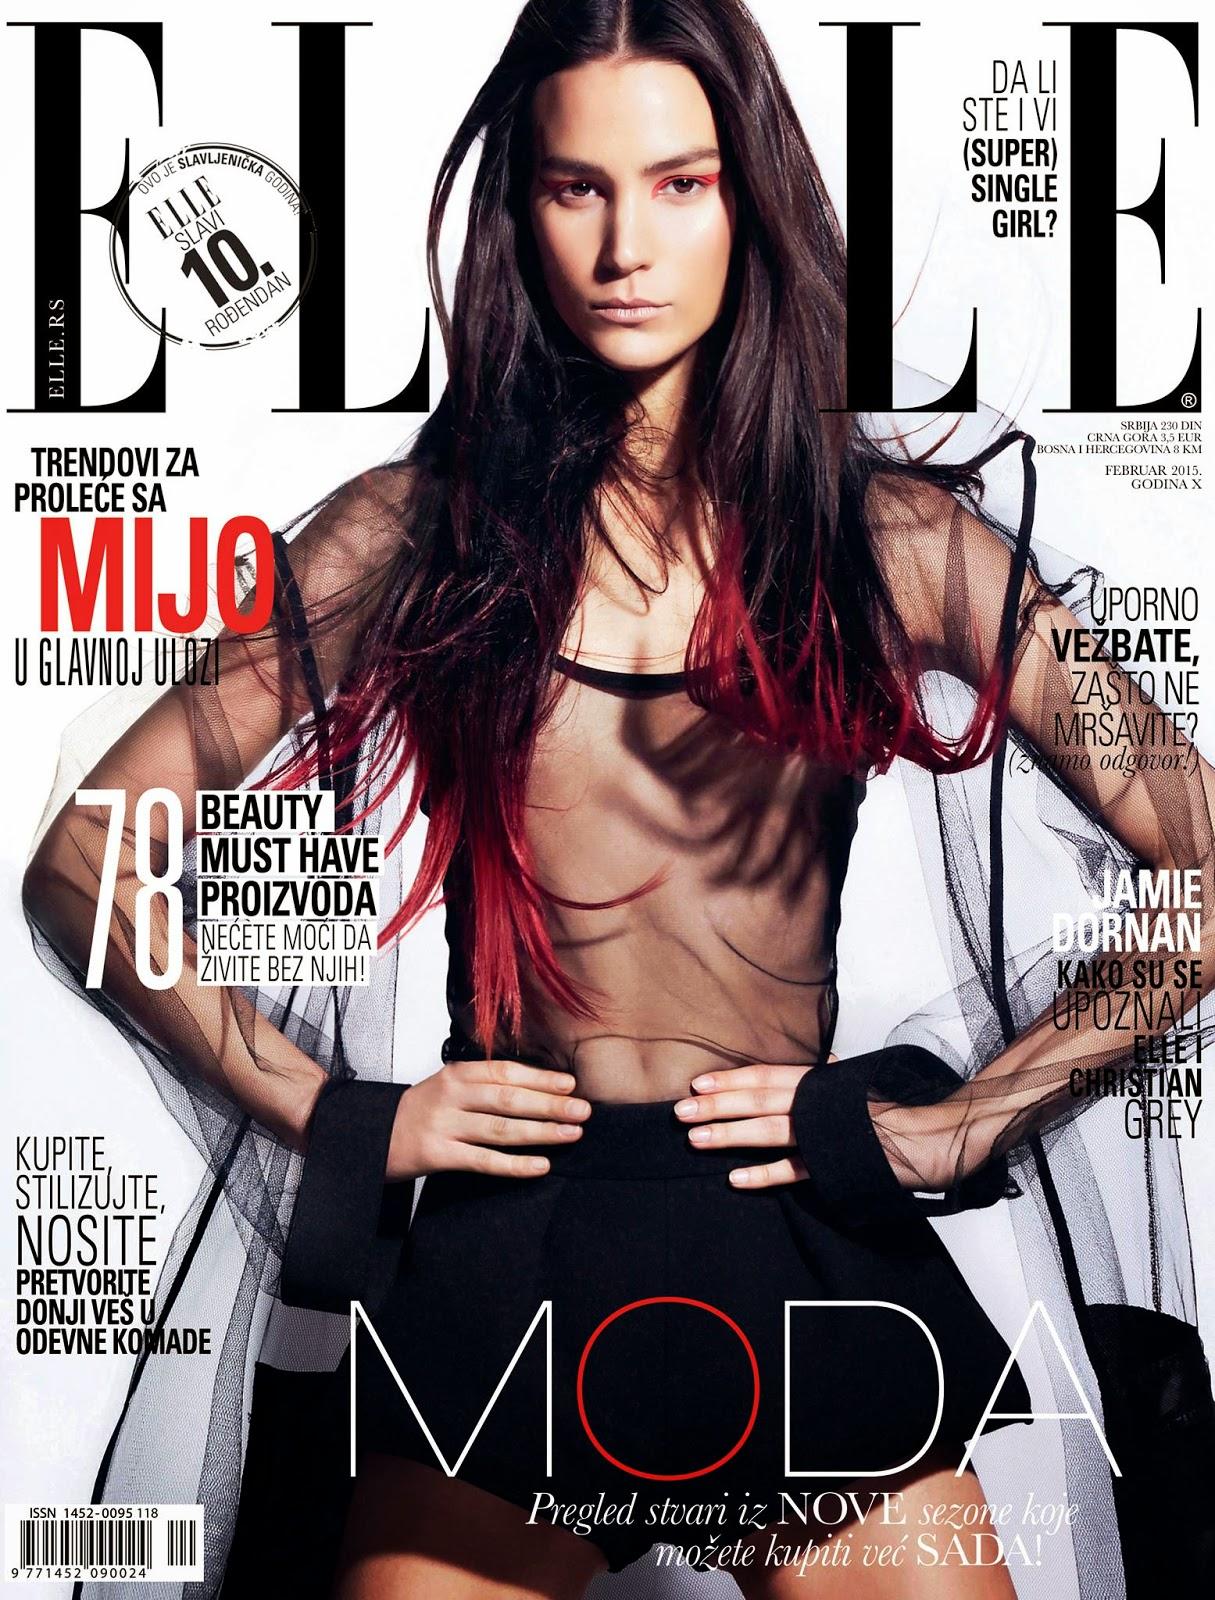 Model: Mijo Mihaljcic - Elle, Serbia, February 2015